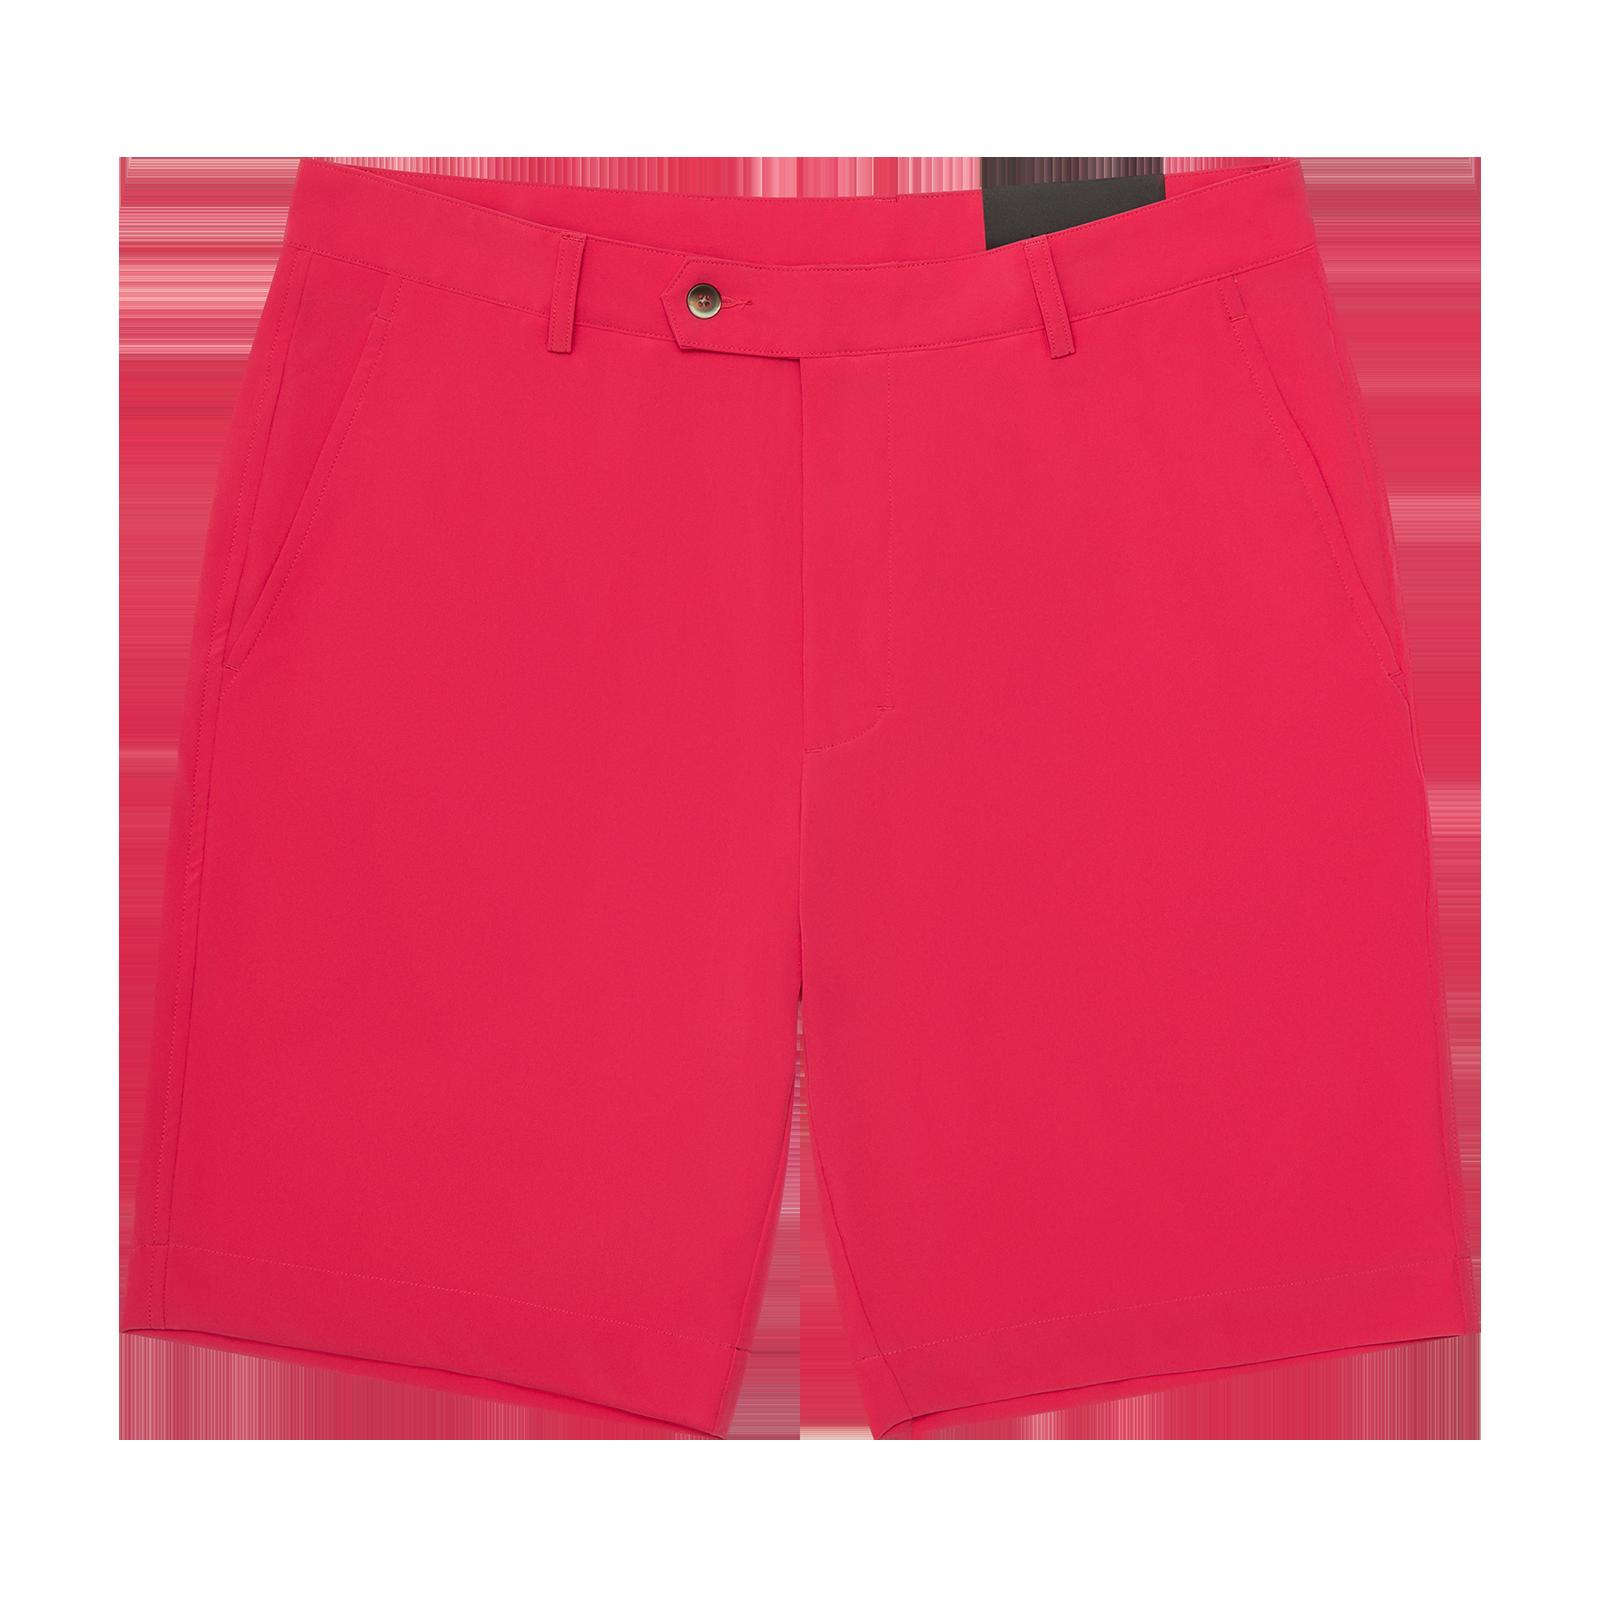 Flat lay shorts product image